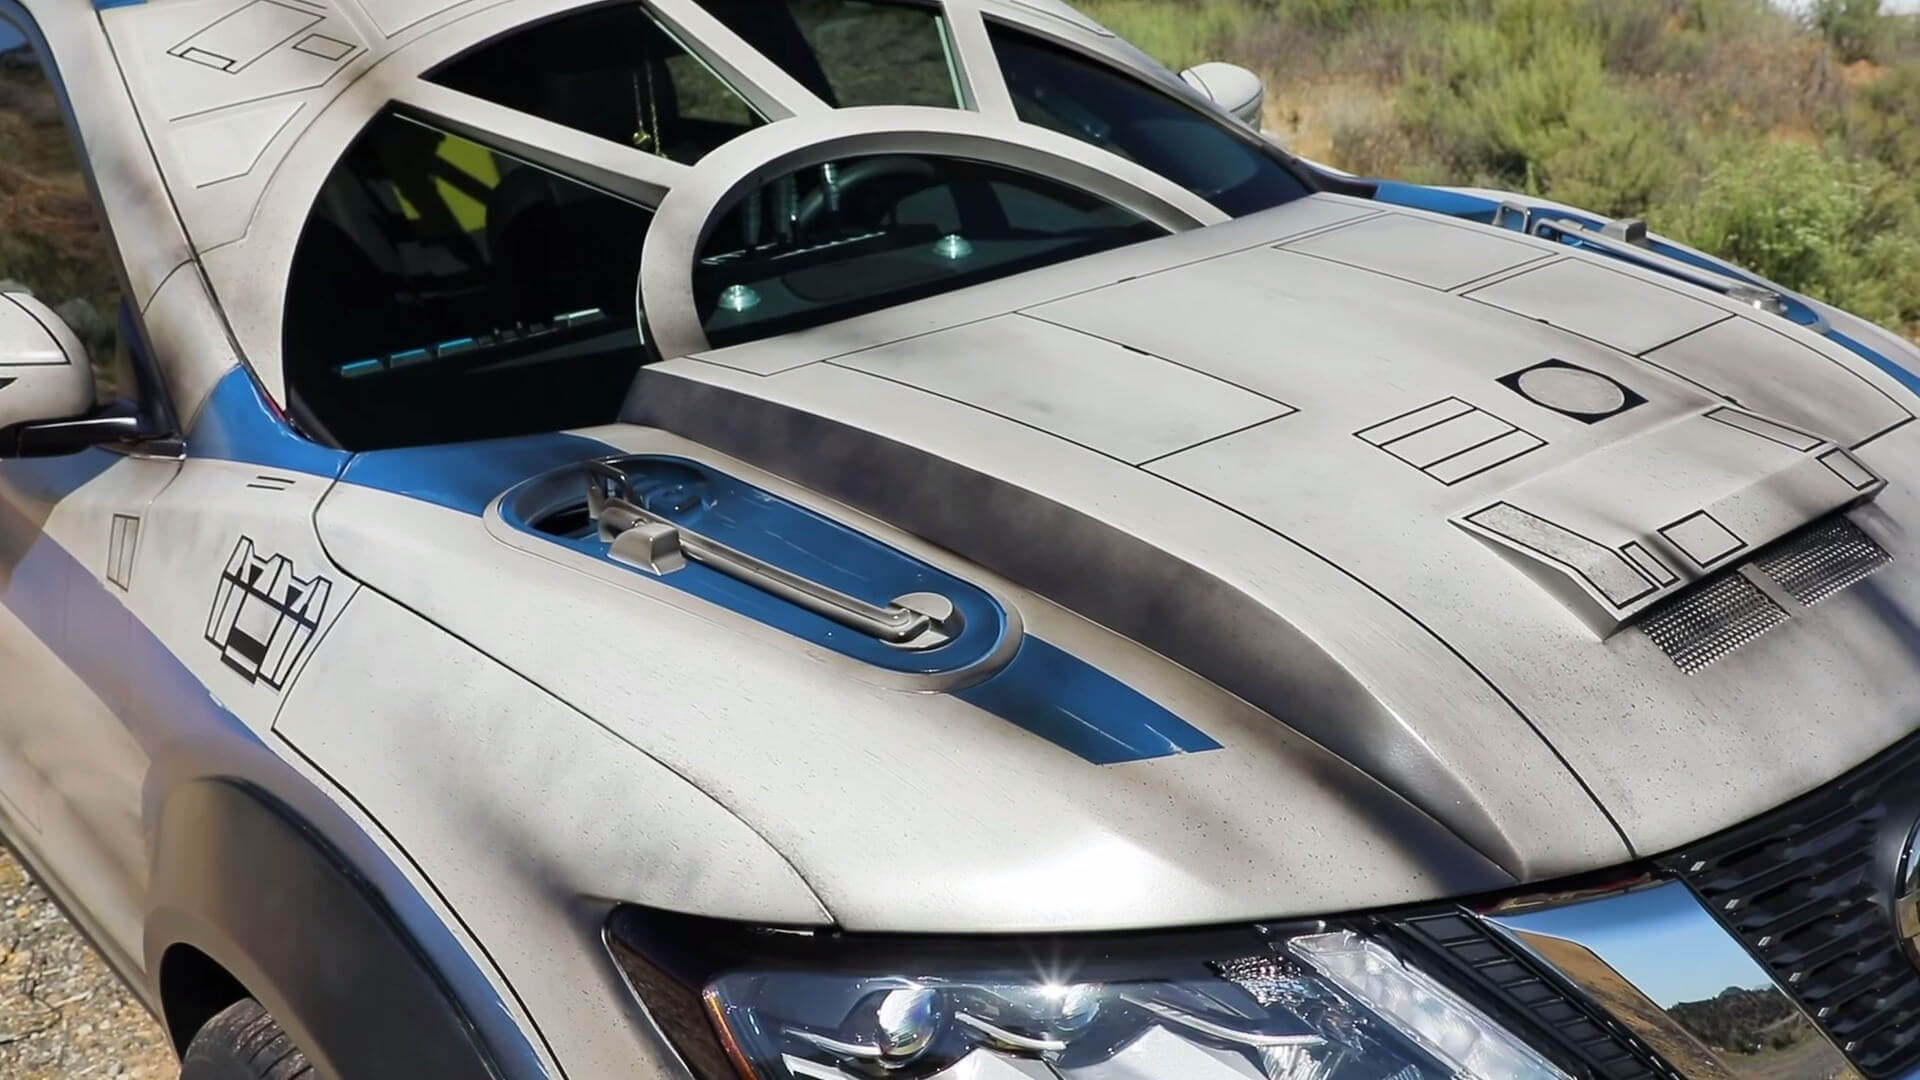 Nissan Rogue Star Wars Themed Show Vehicle screenshot 1